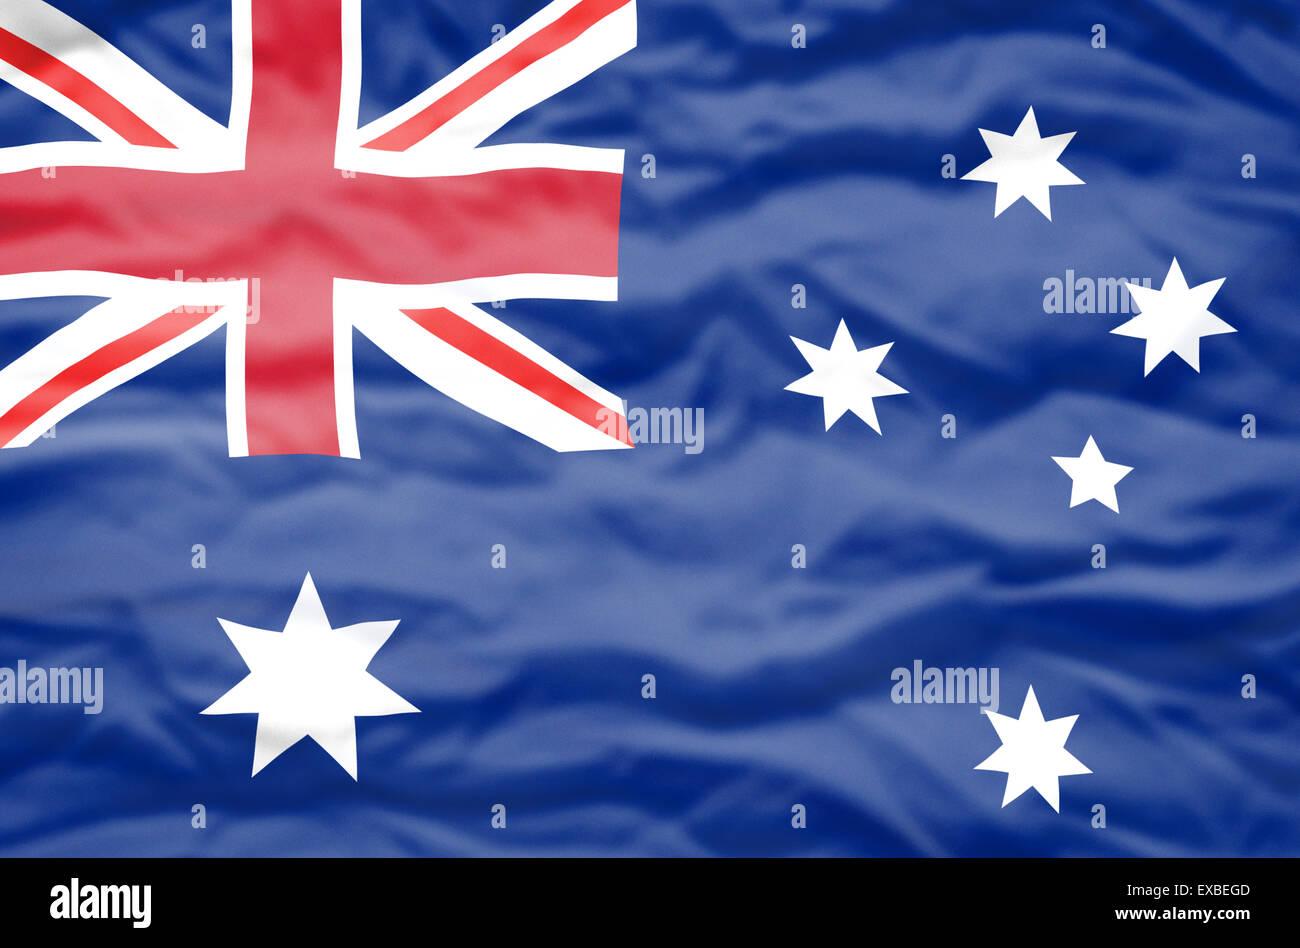 australia flag wavy flag of australia fills the frame stock photo